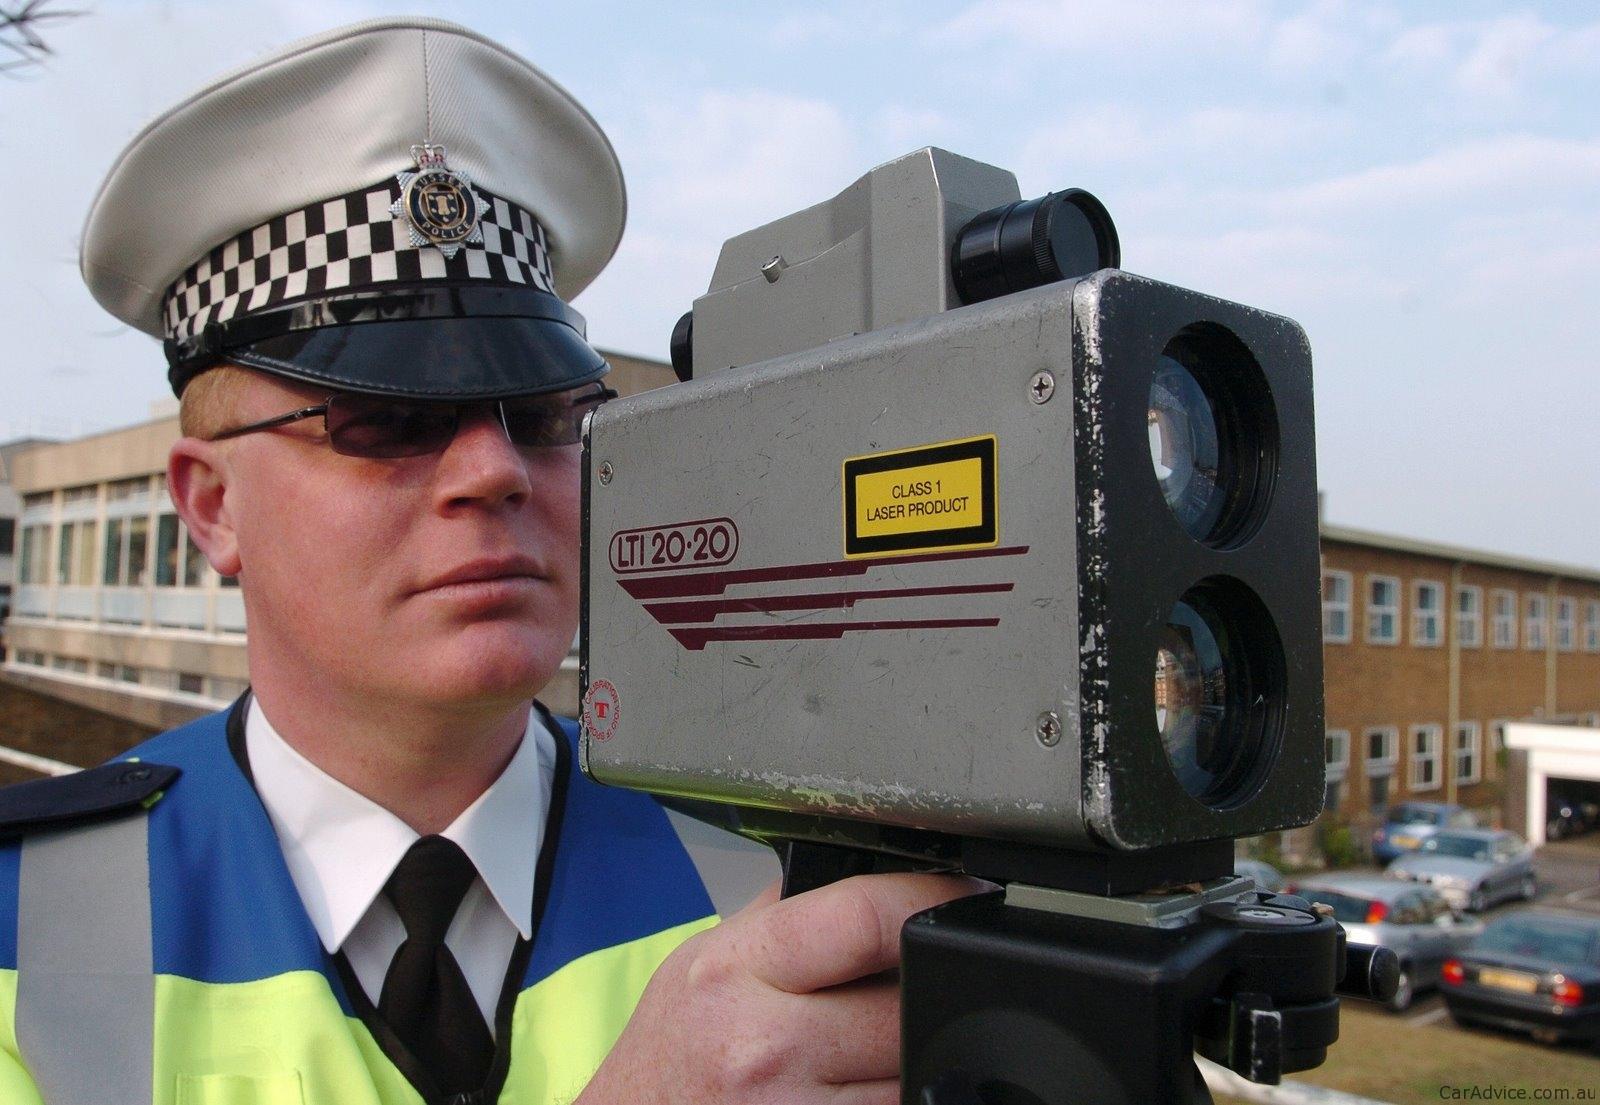 2-Police-Laser-Equipment